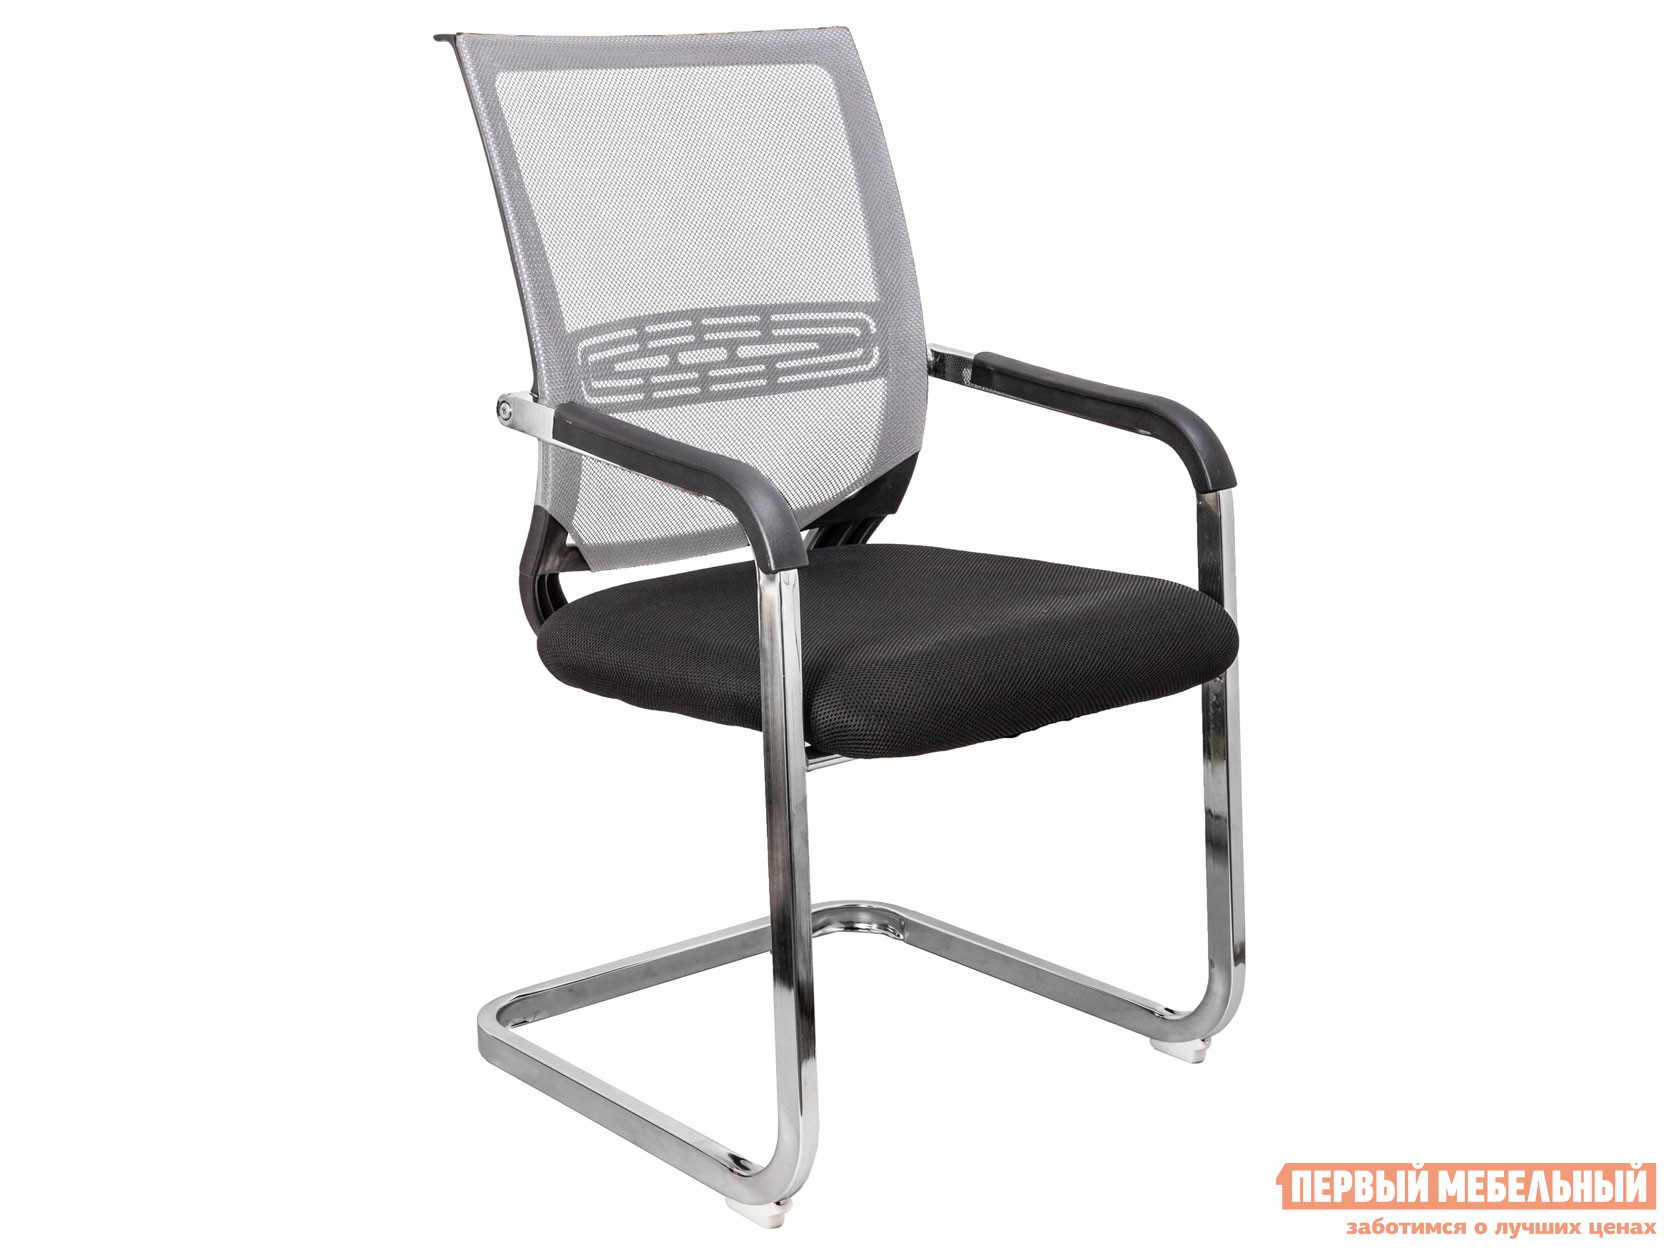 Офисный стул  Стул LUCAS Серый, сетка — Стул LUCAS Серый, сетка